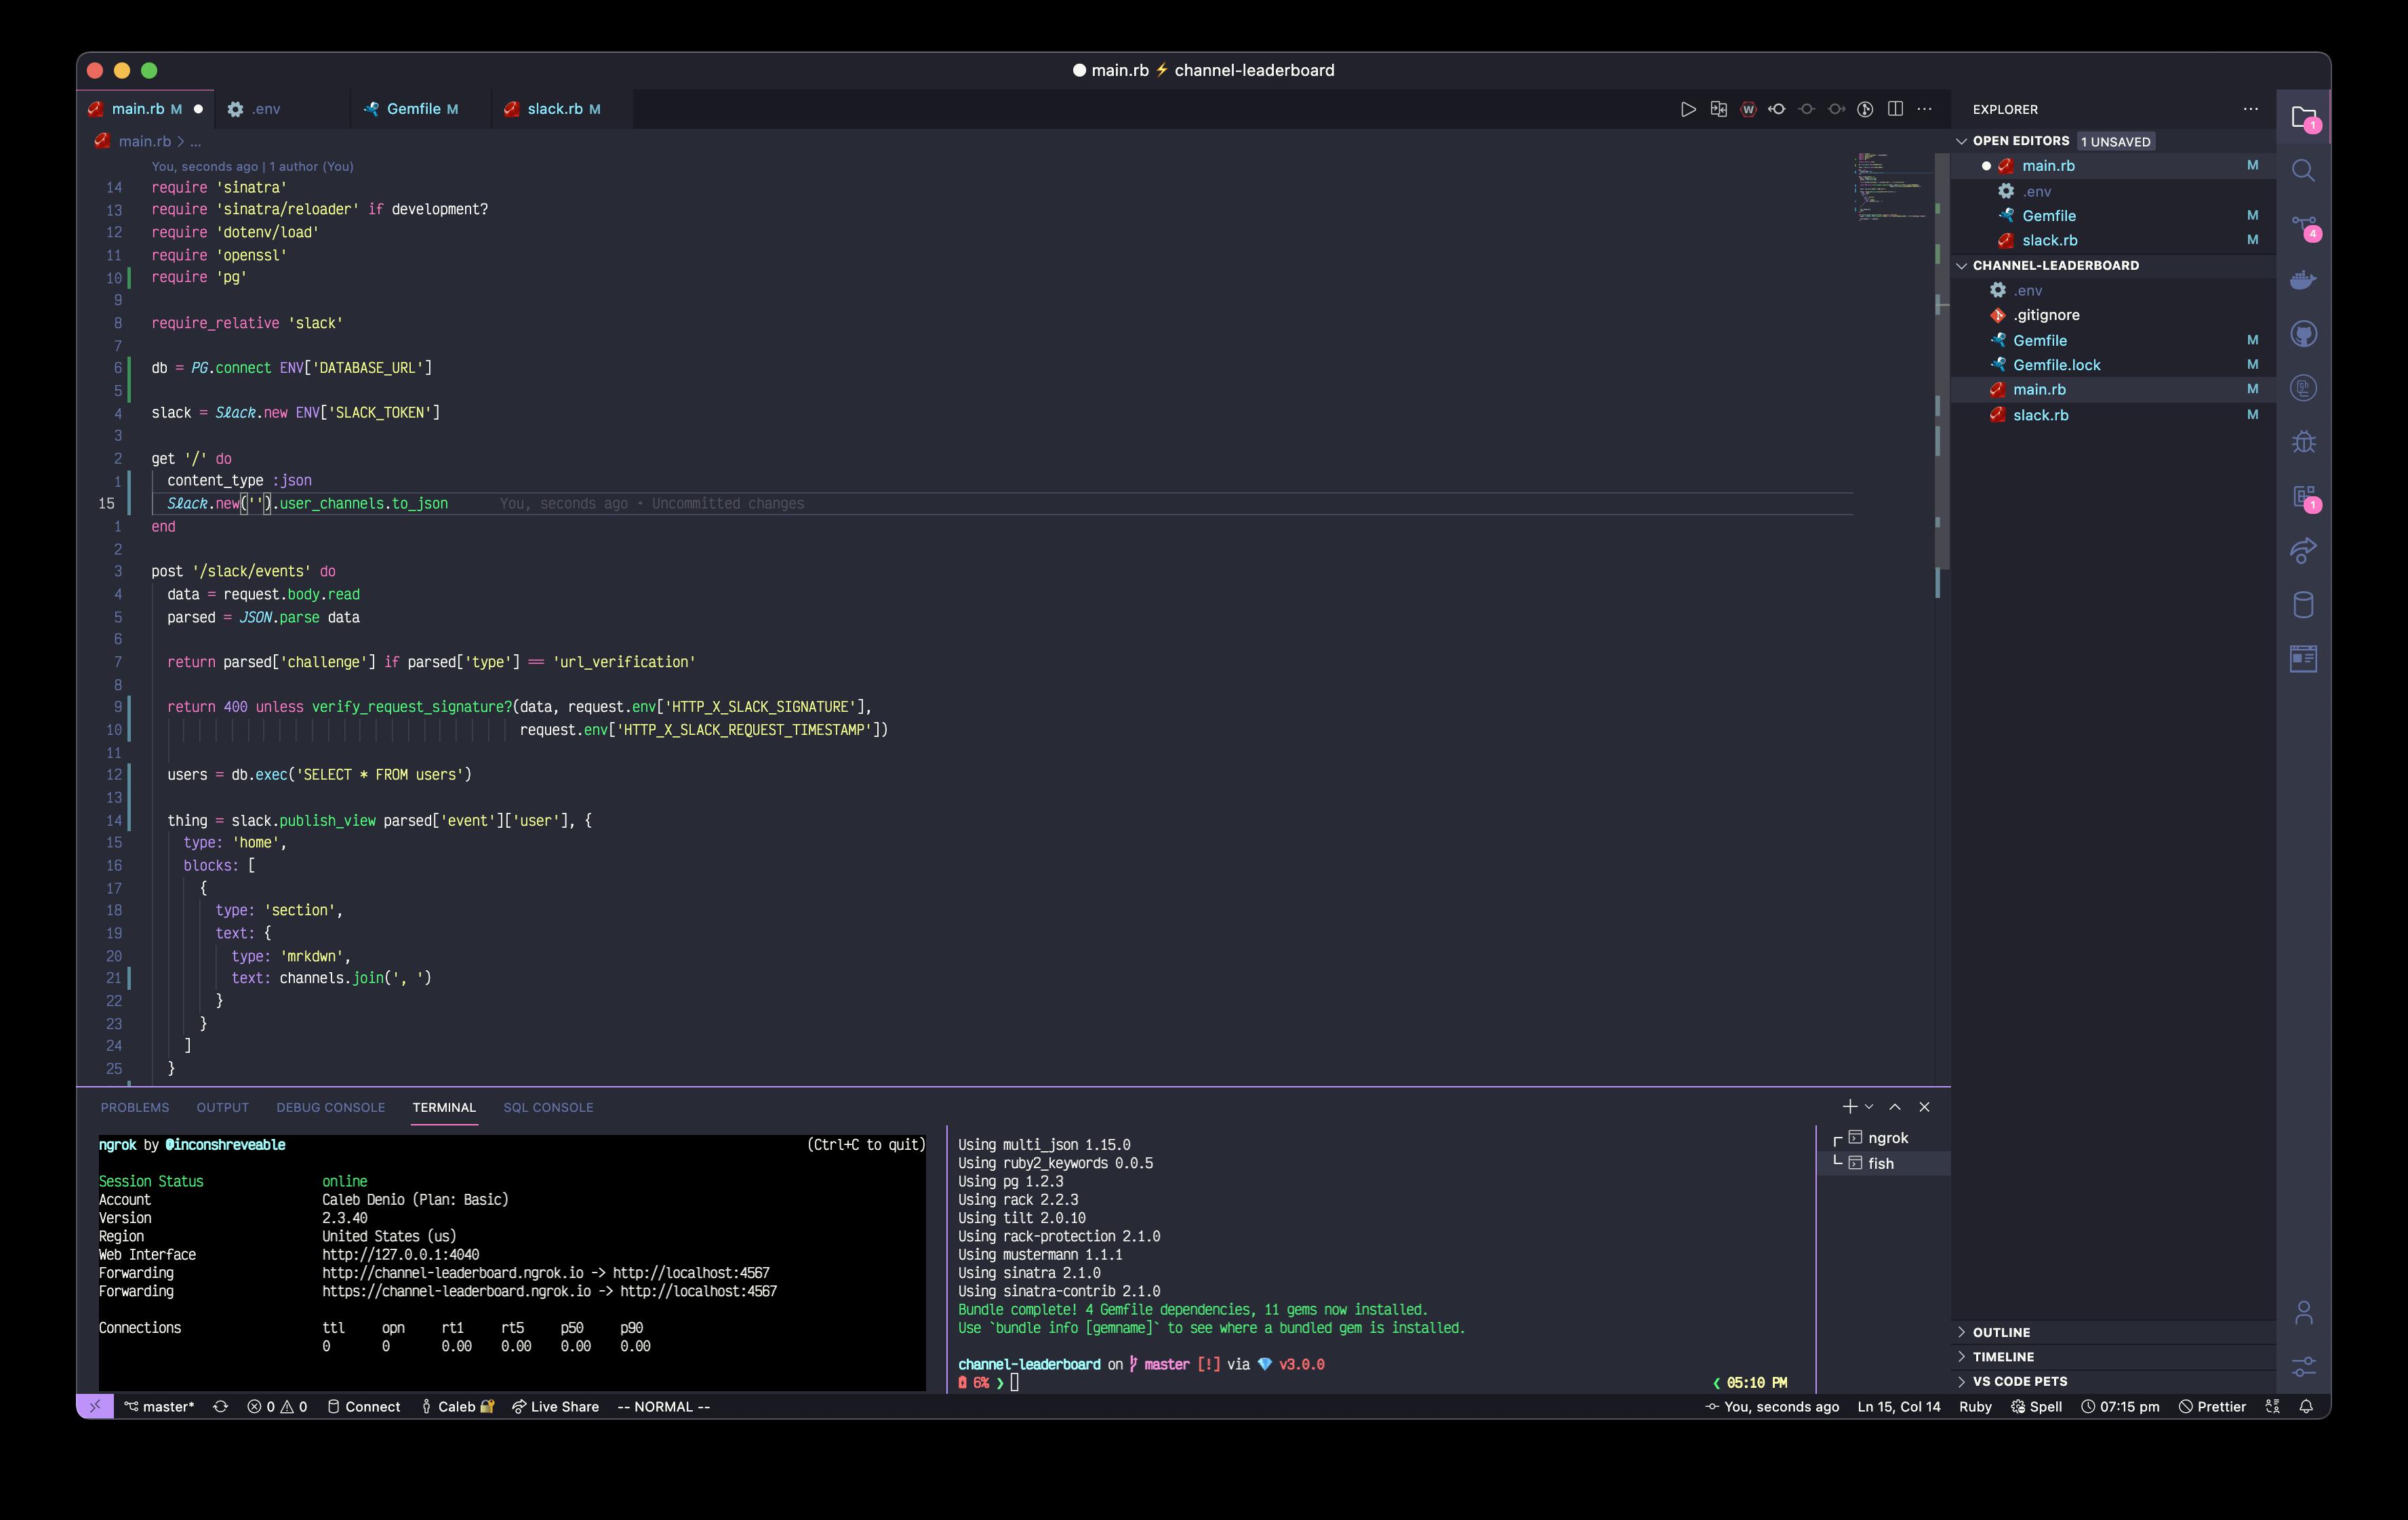 https://cloud-dc6vue22h-hack-club-bot.vercel.app/0screen_shot_2021-09-16_at_7.15.40_pm.png